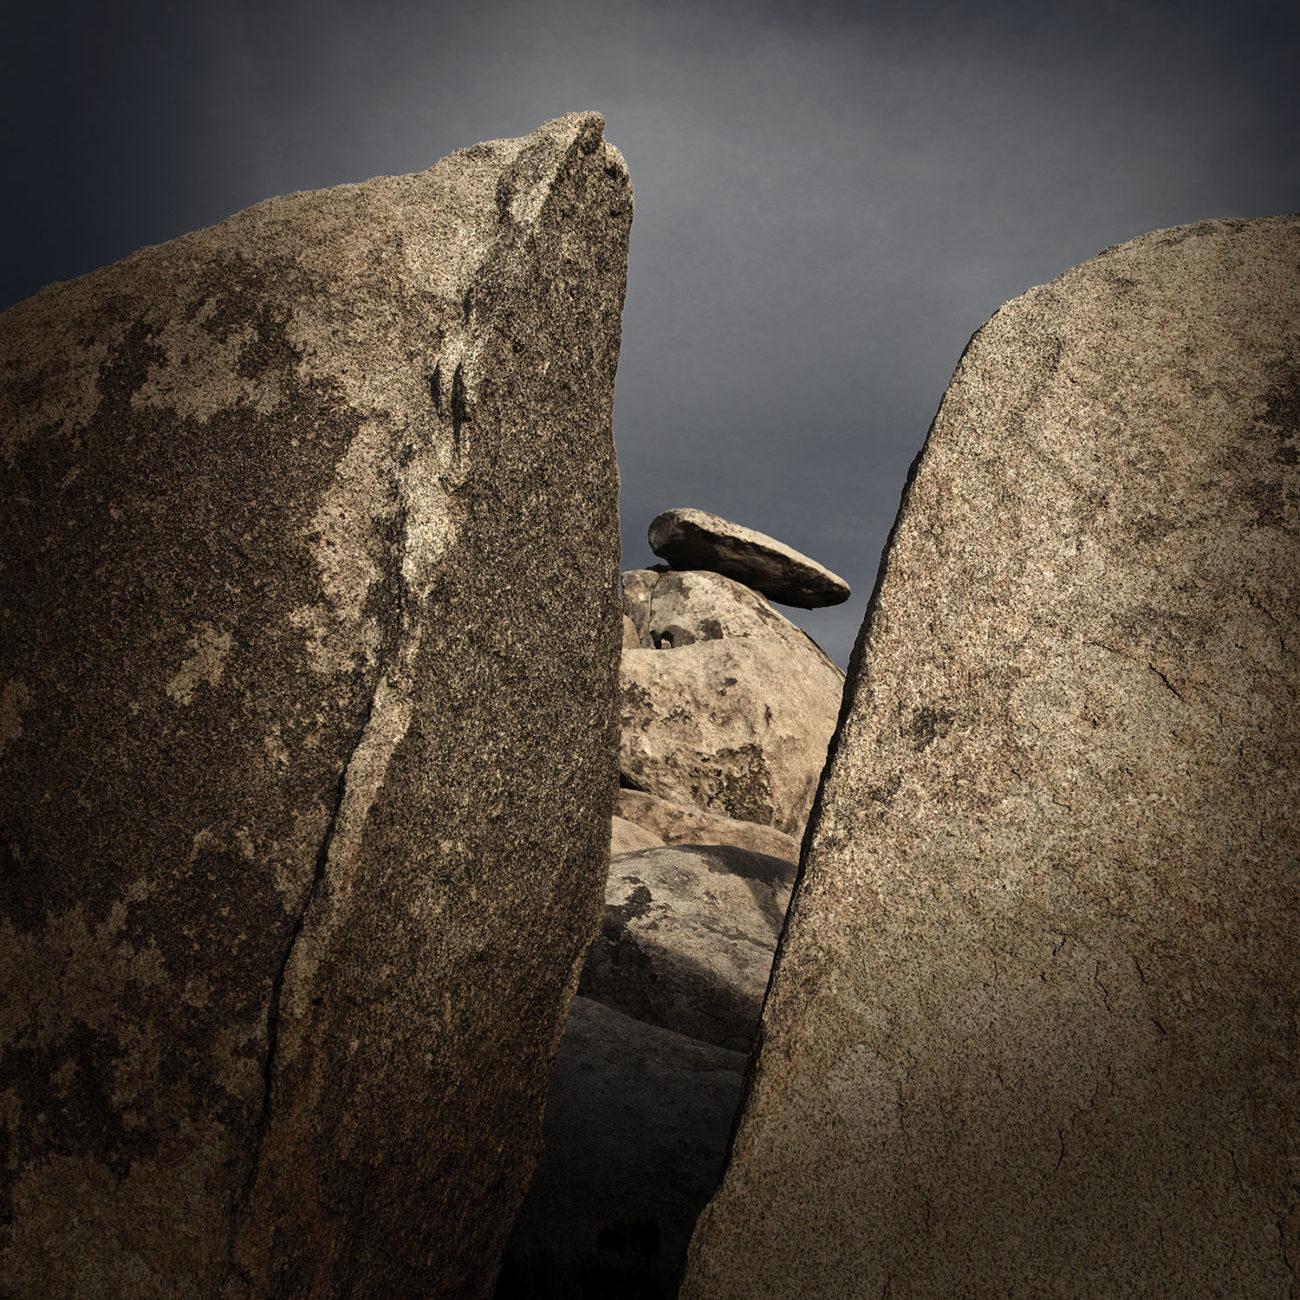 Cap rock, Joshua Tree NP